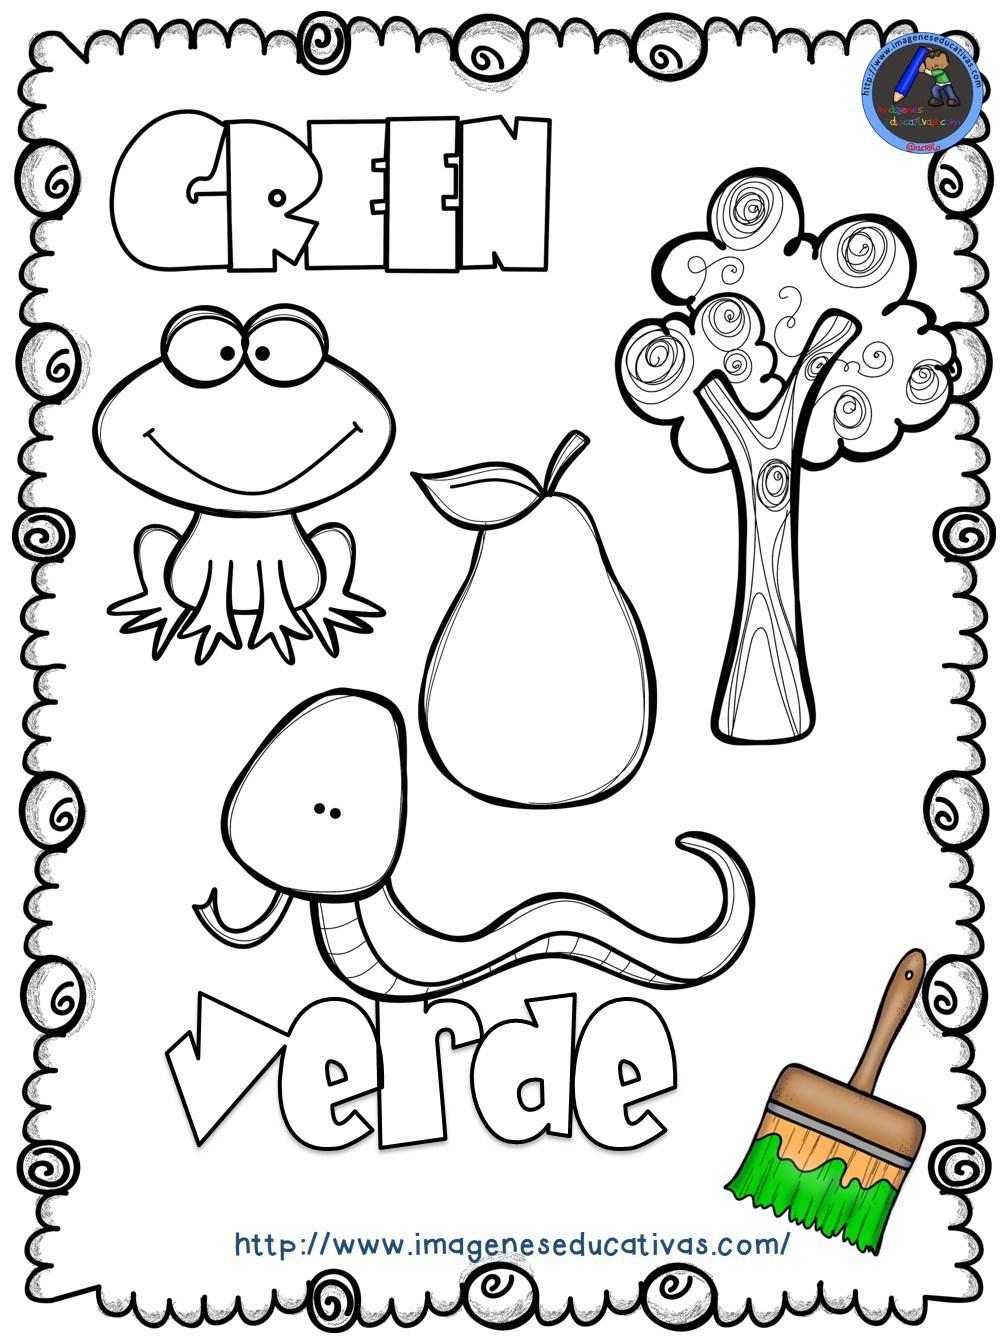 Atractivo Kitty Kallen Mi Libro Para Colorear Componente - Dibujos ...